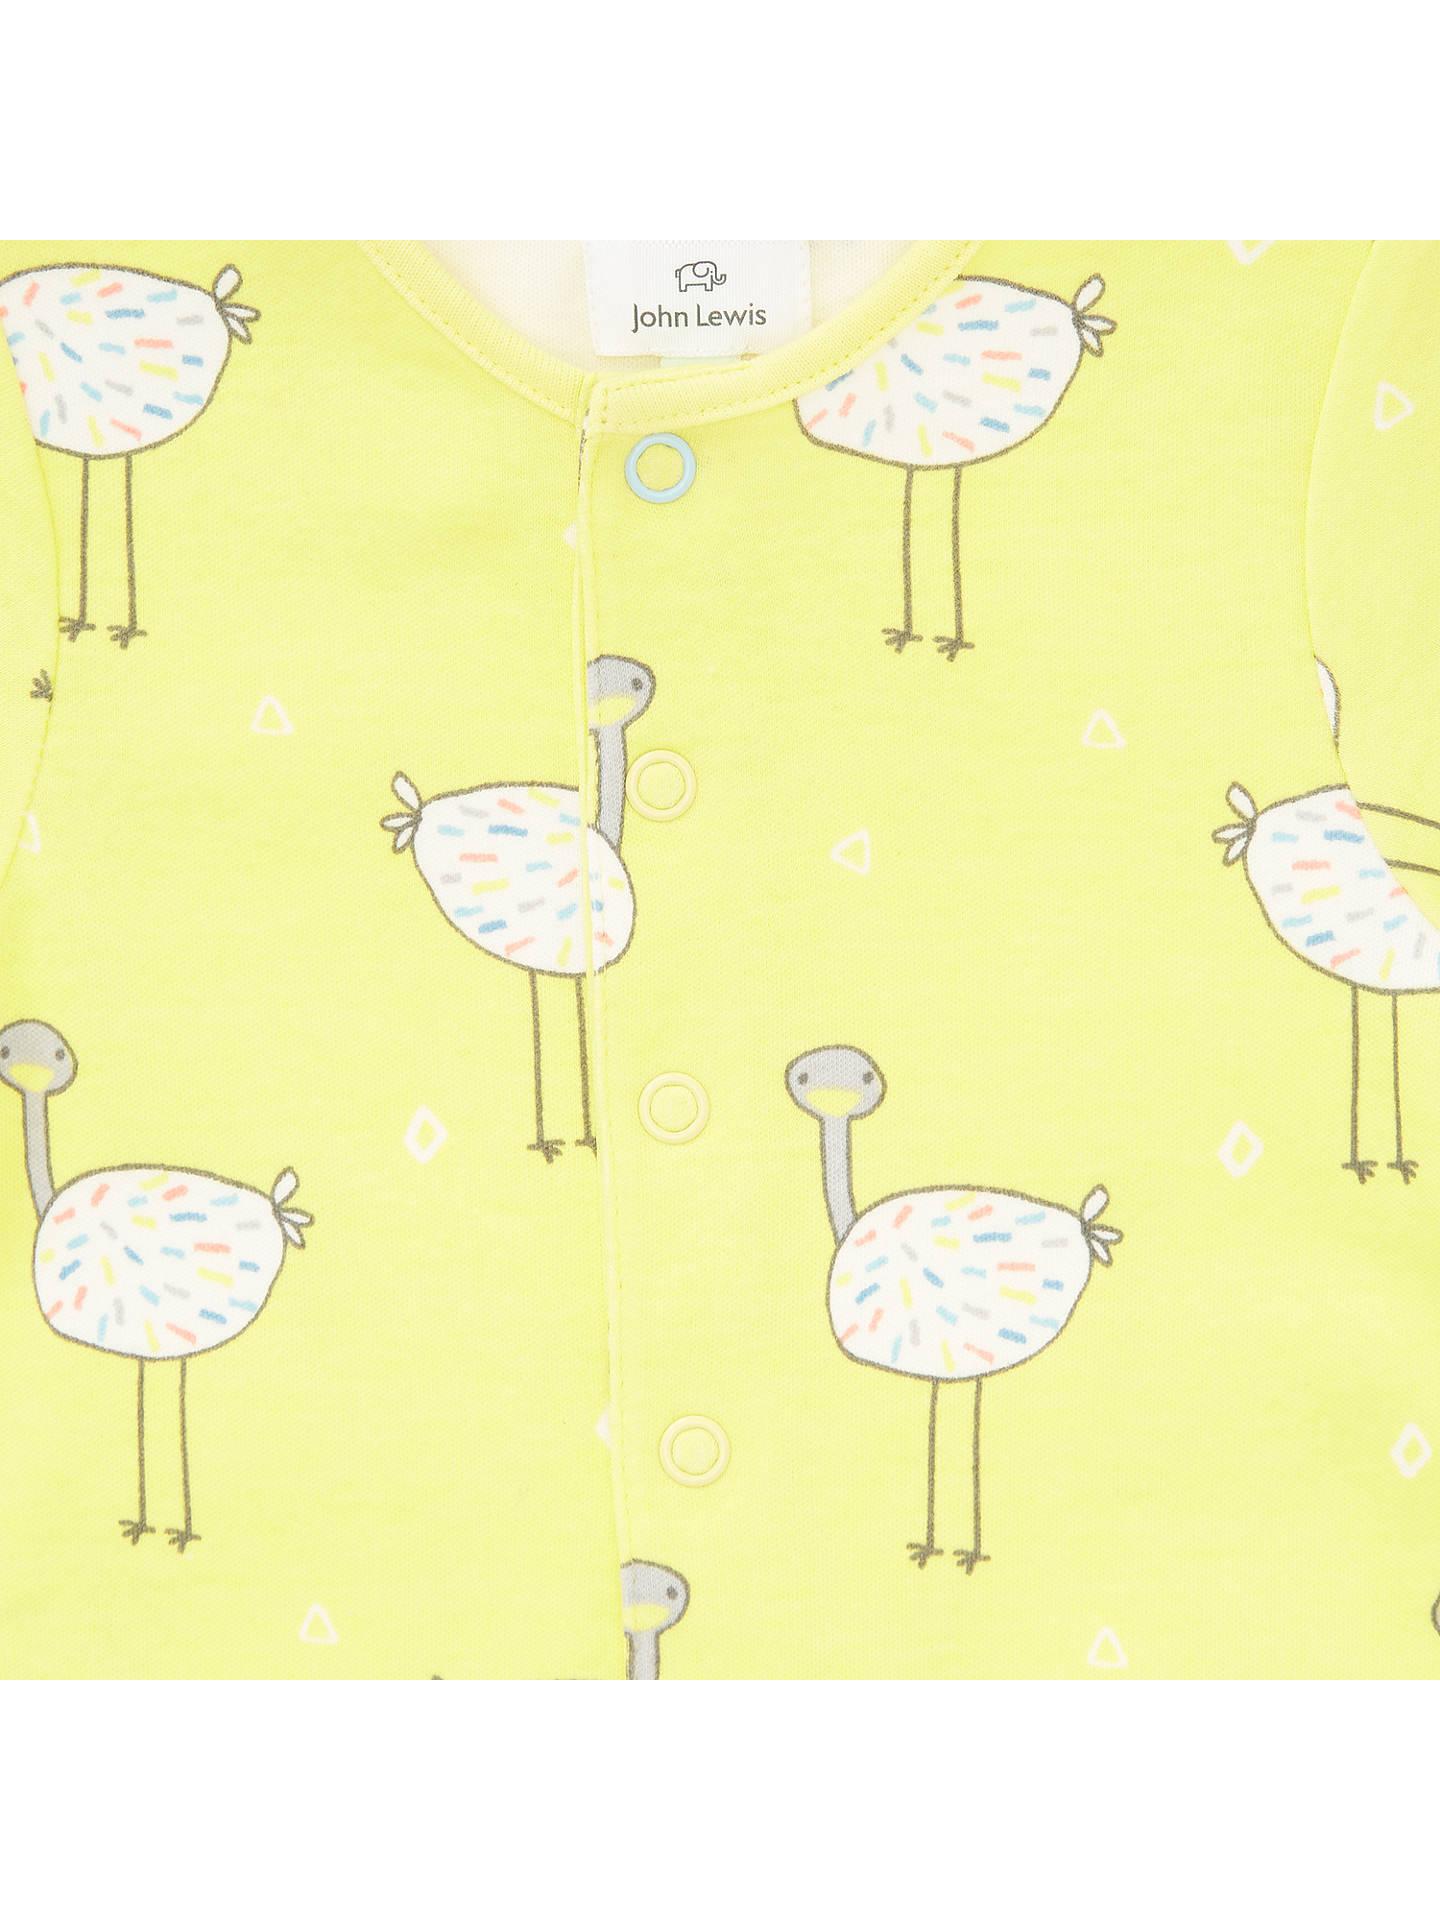 6dc3cda62 John Lewis Baby GOTS Organic Cotton Ostrich Romper